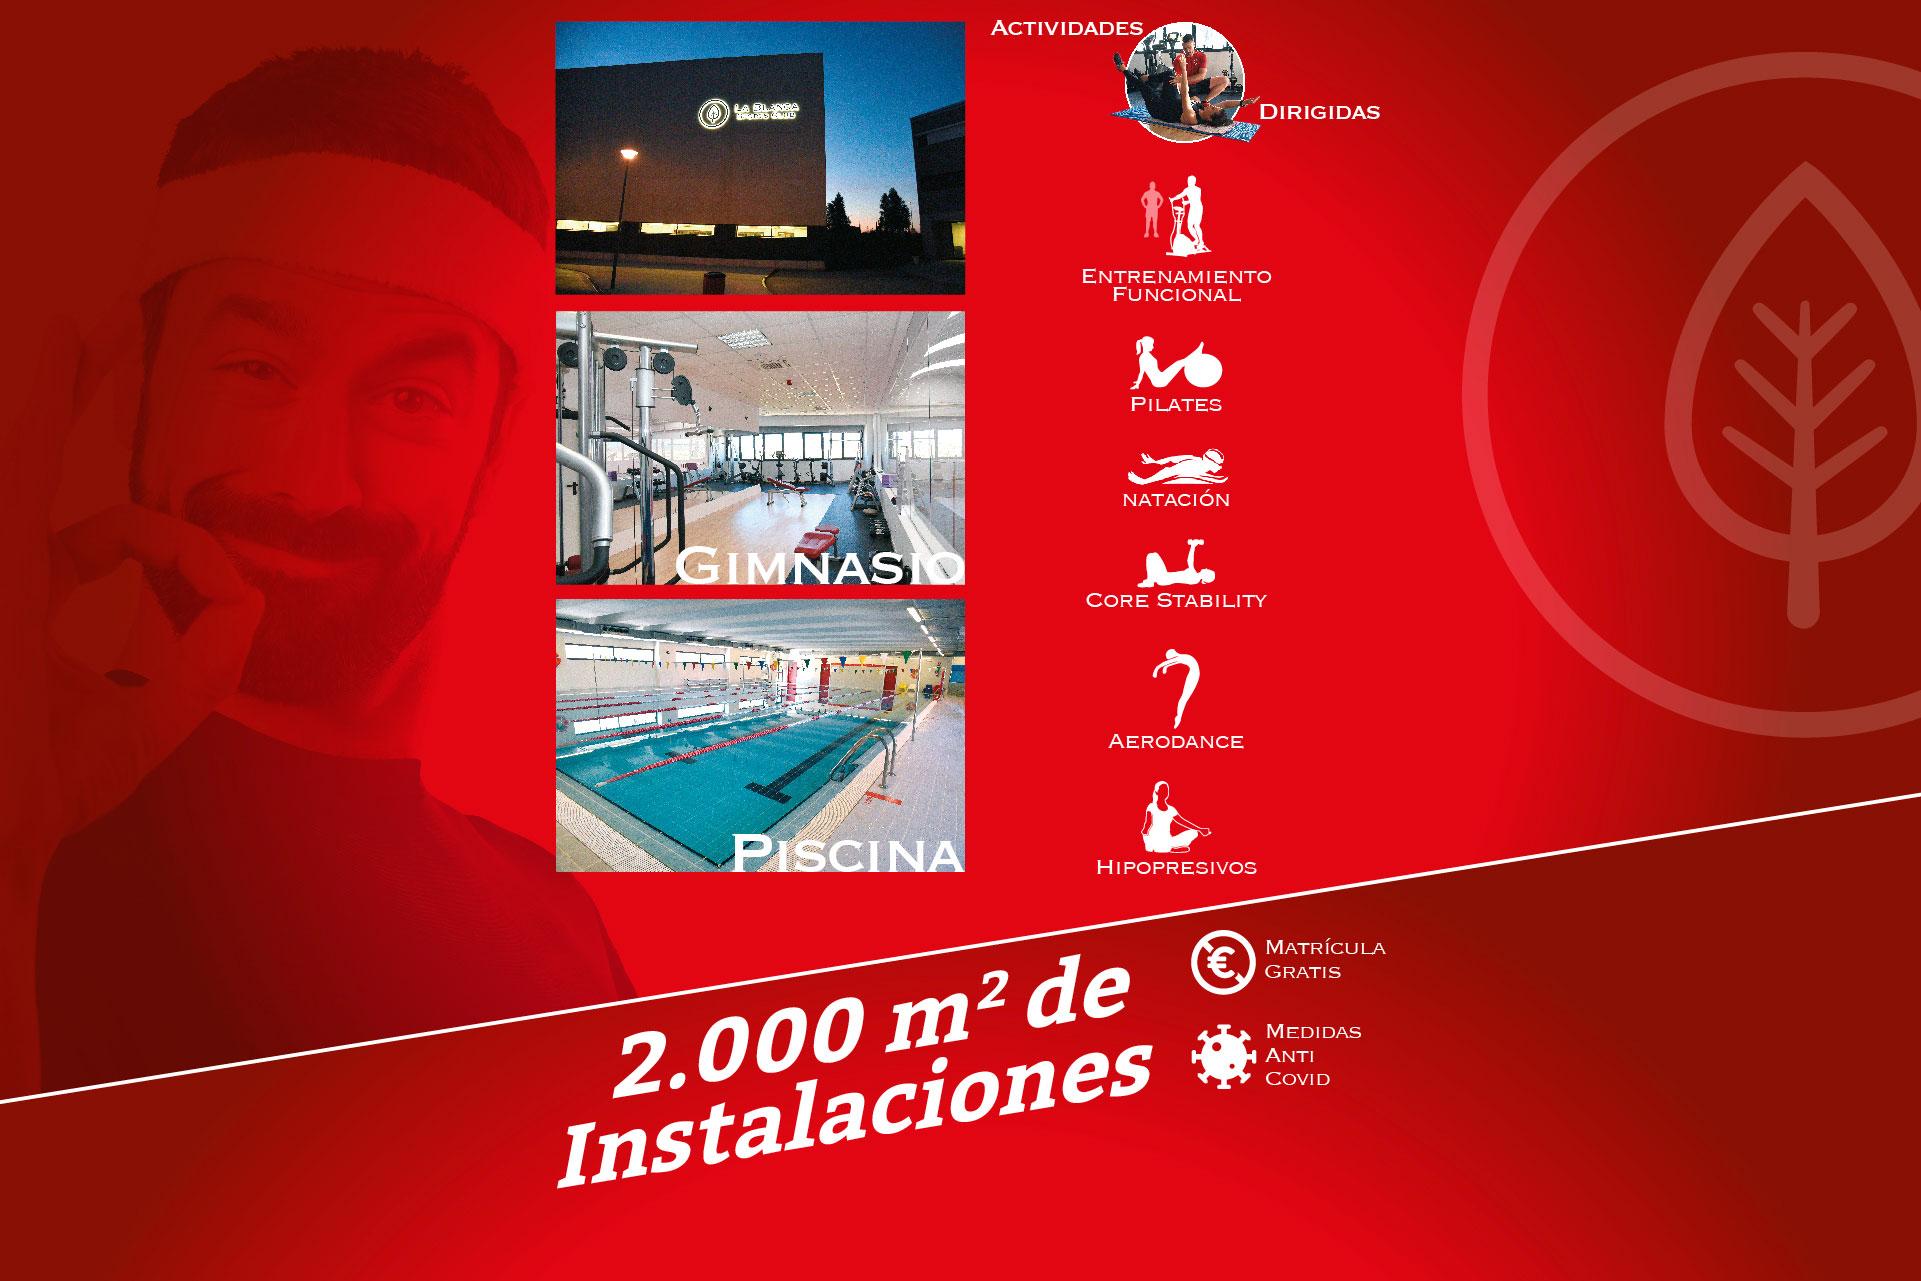 La Blanca Sports Club Gimnasio Montecarmelo Madrid 2000 m instalaciones